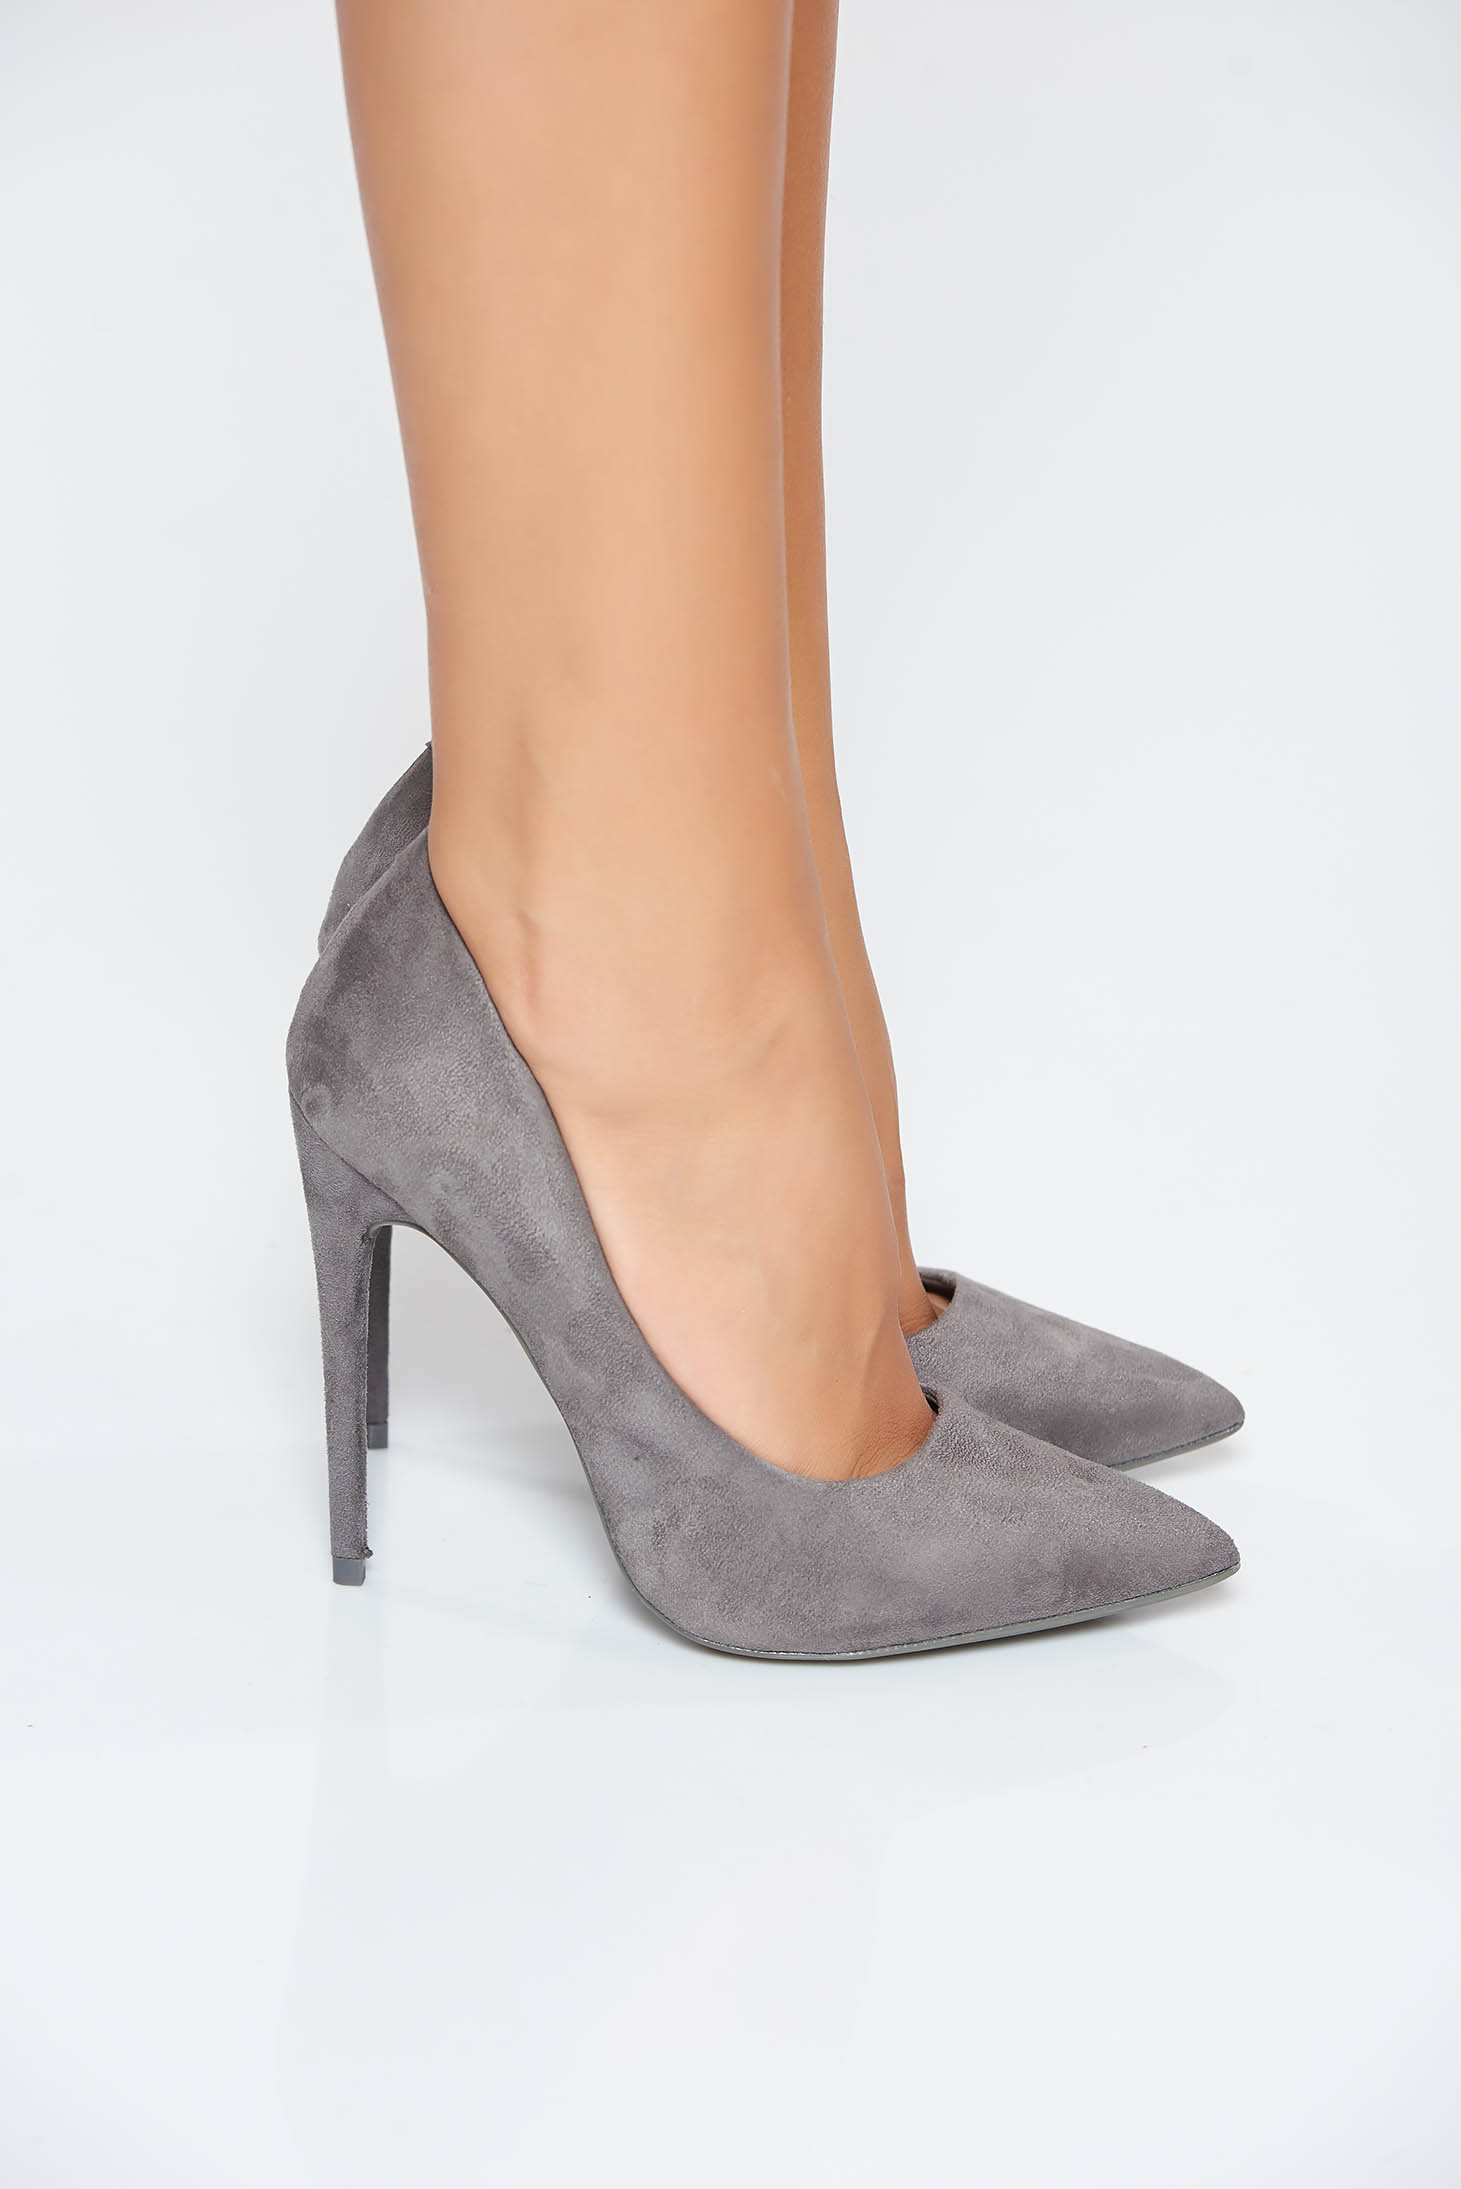 Pantofi gri elegant din material catifelat cu toc inalt cu varful usor ascutit